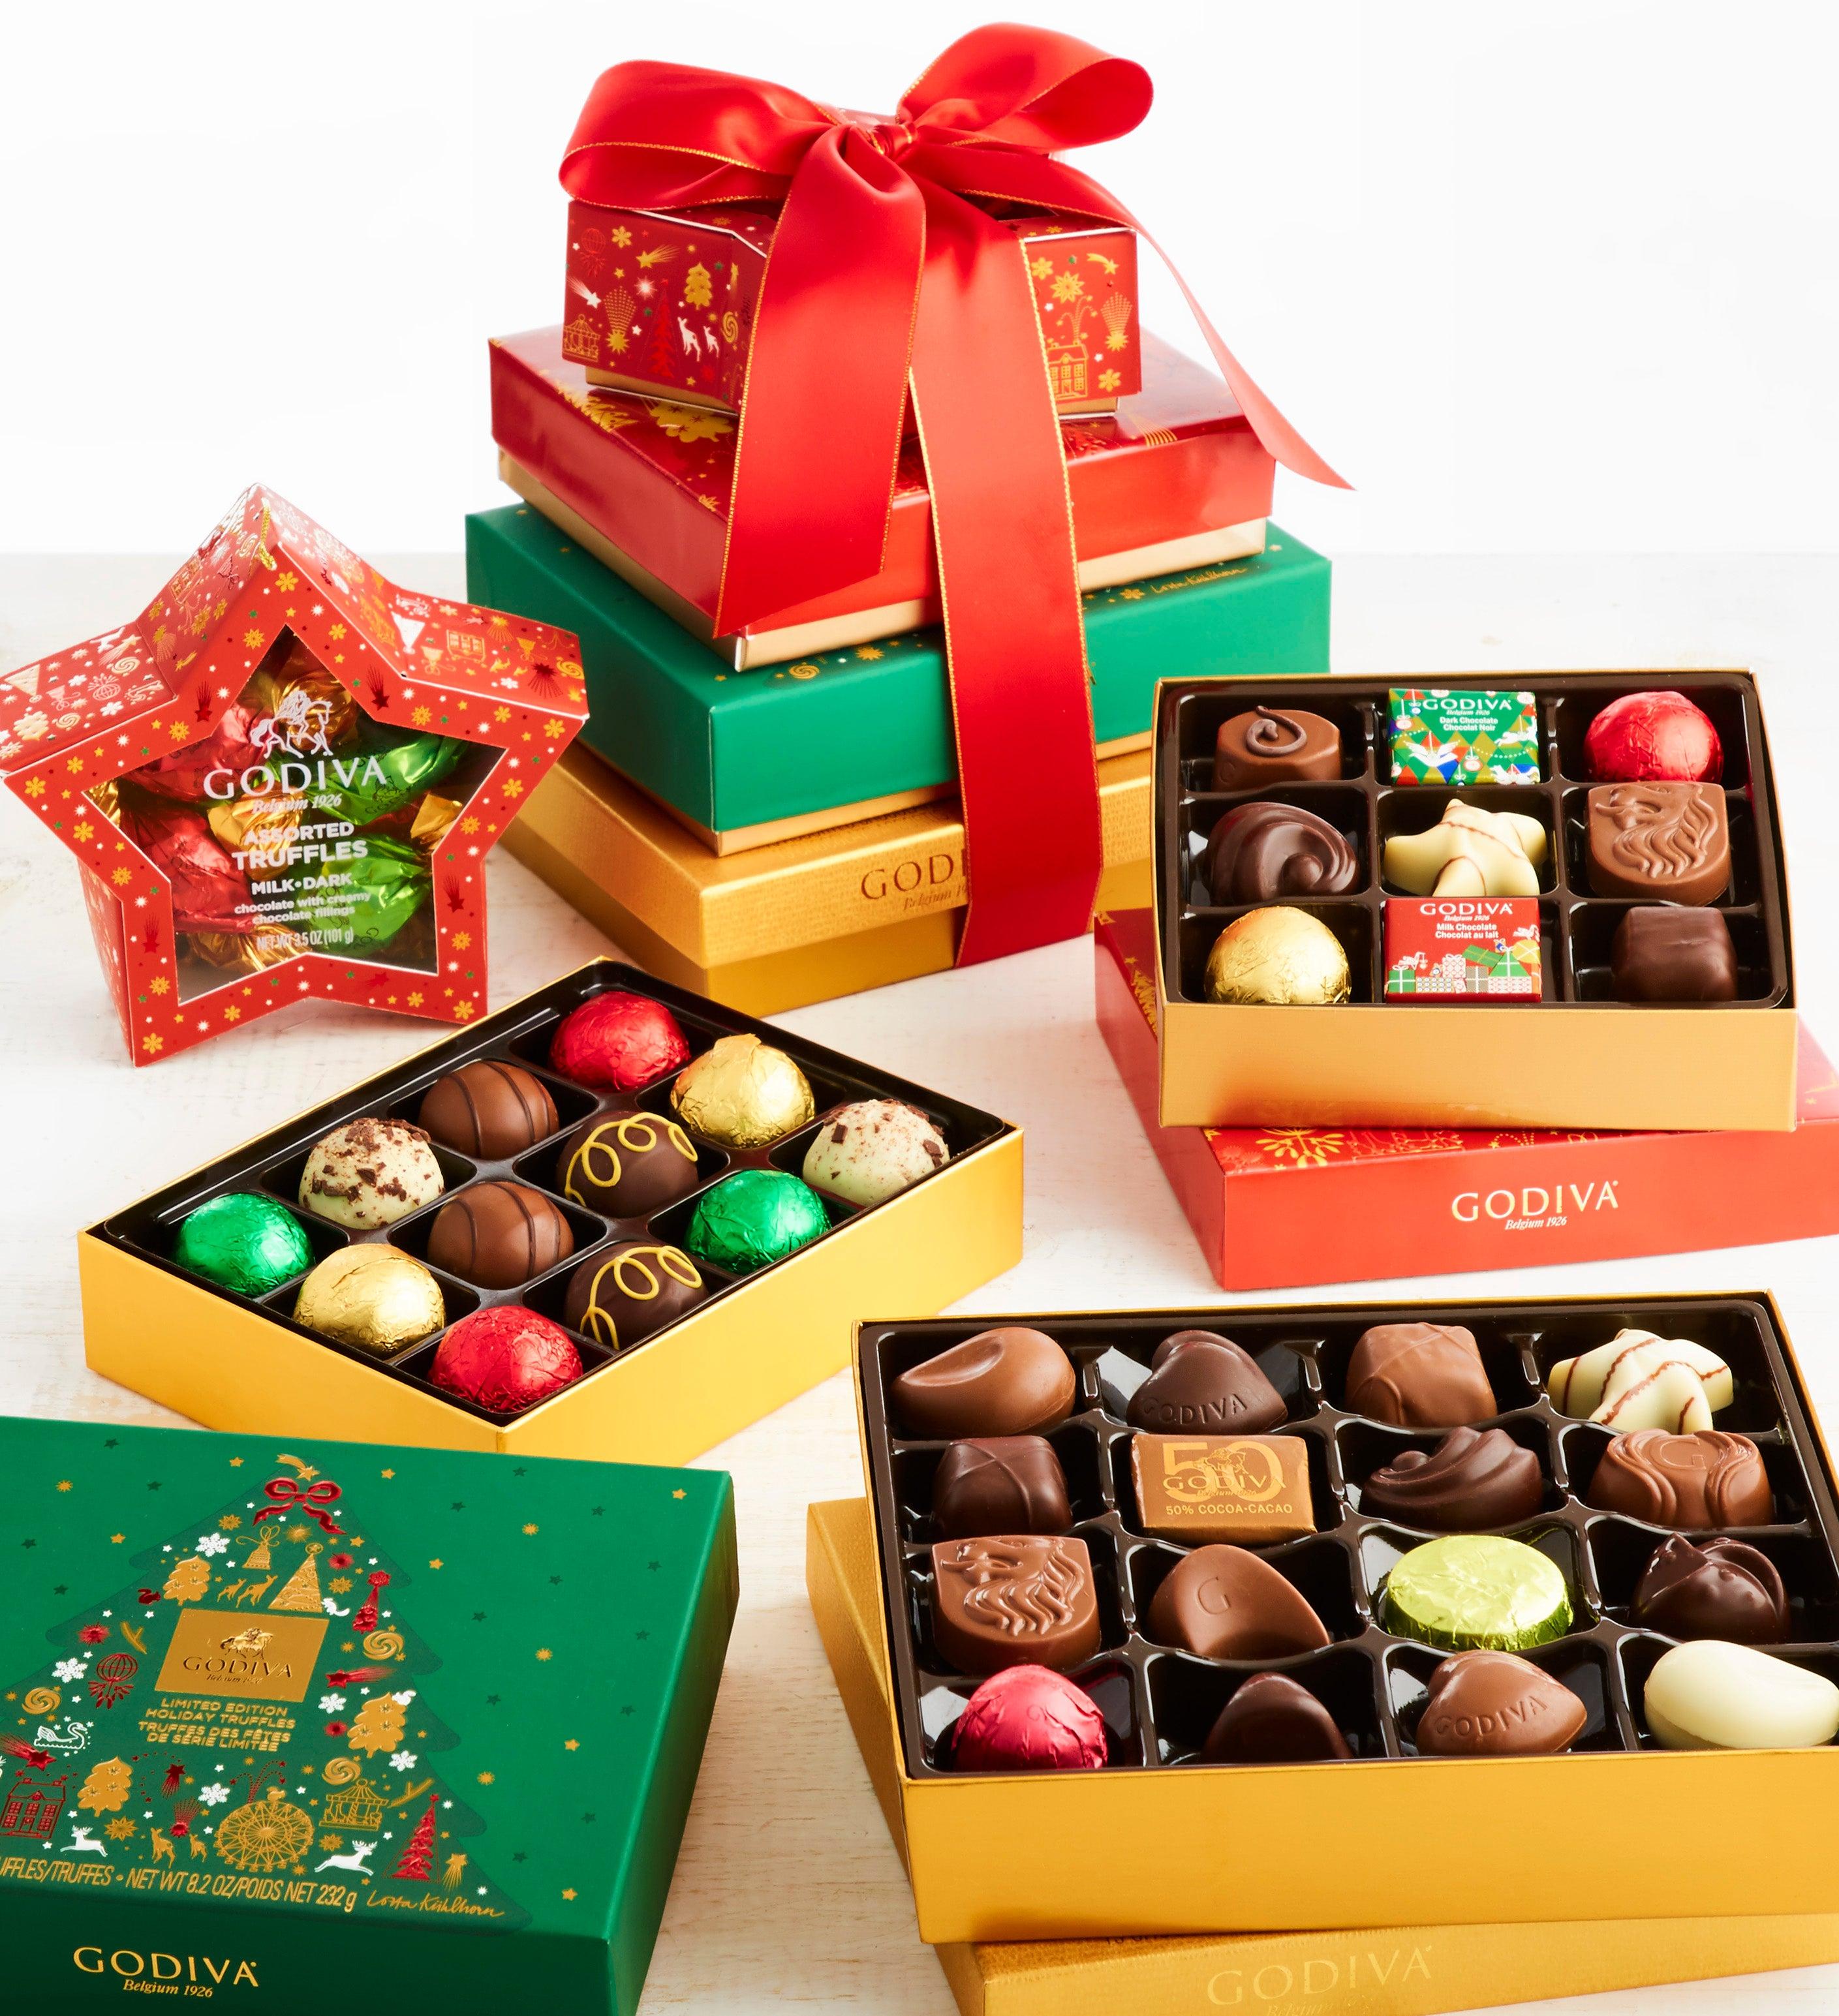 Godiva  Exclusive Holiday Chocolates Tower